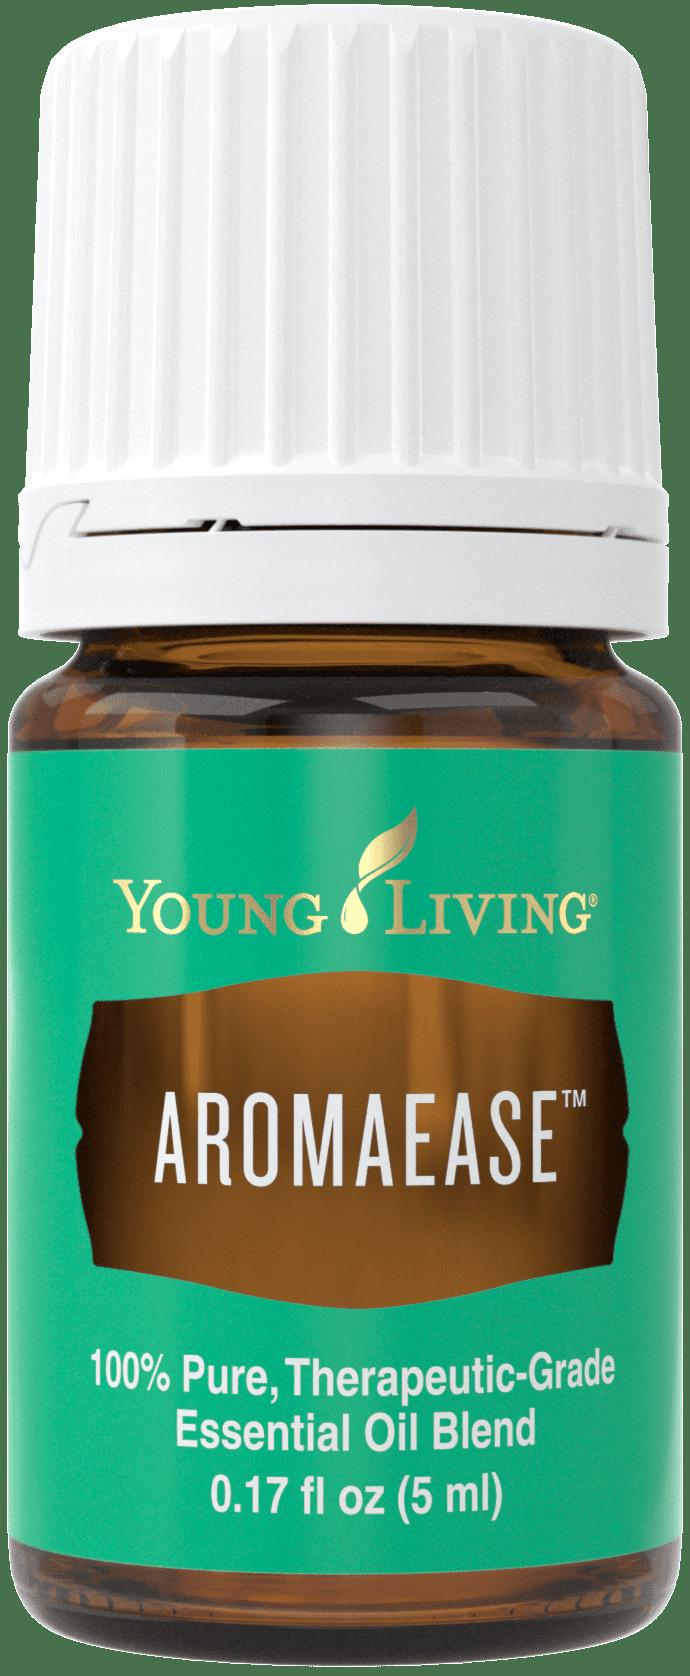 Ätherisches Öl Young Living: AromaEase (Bauch) 5ml